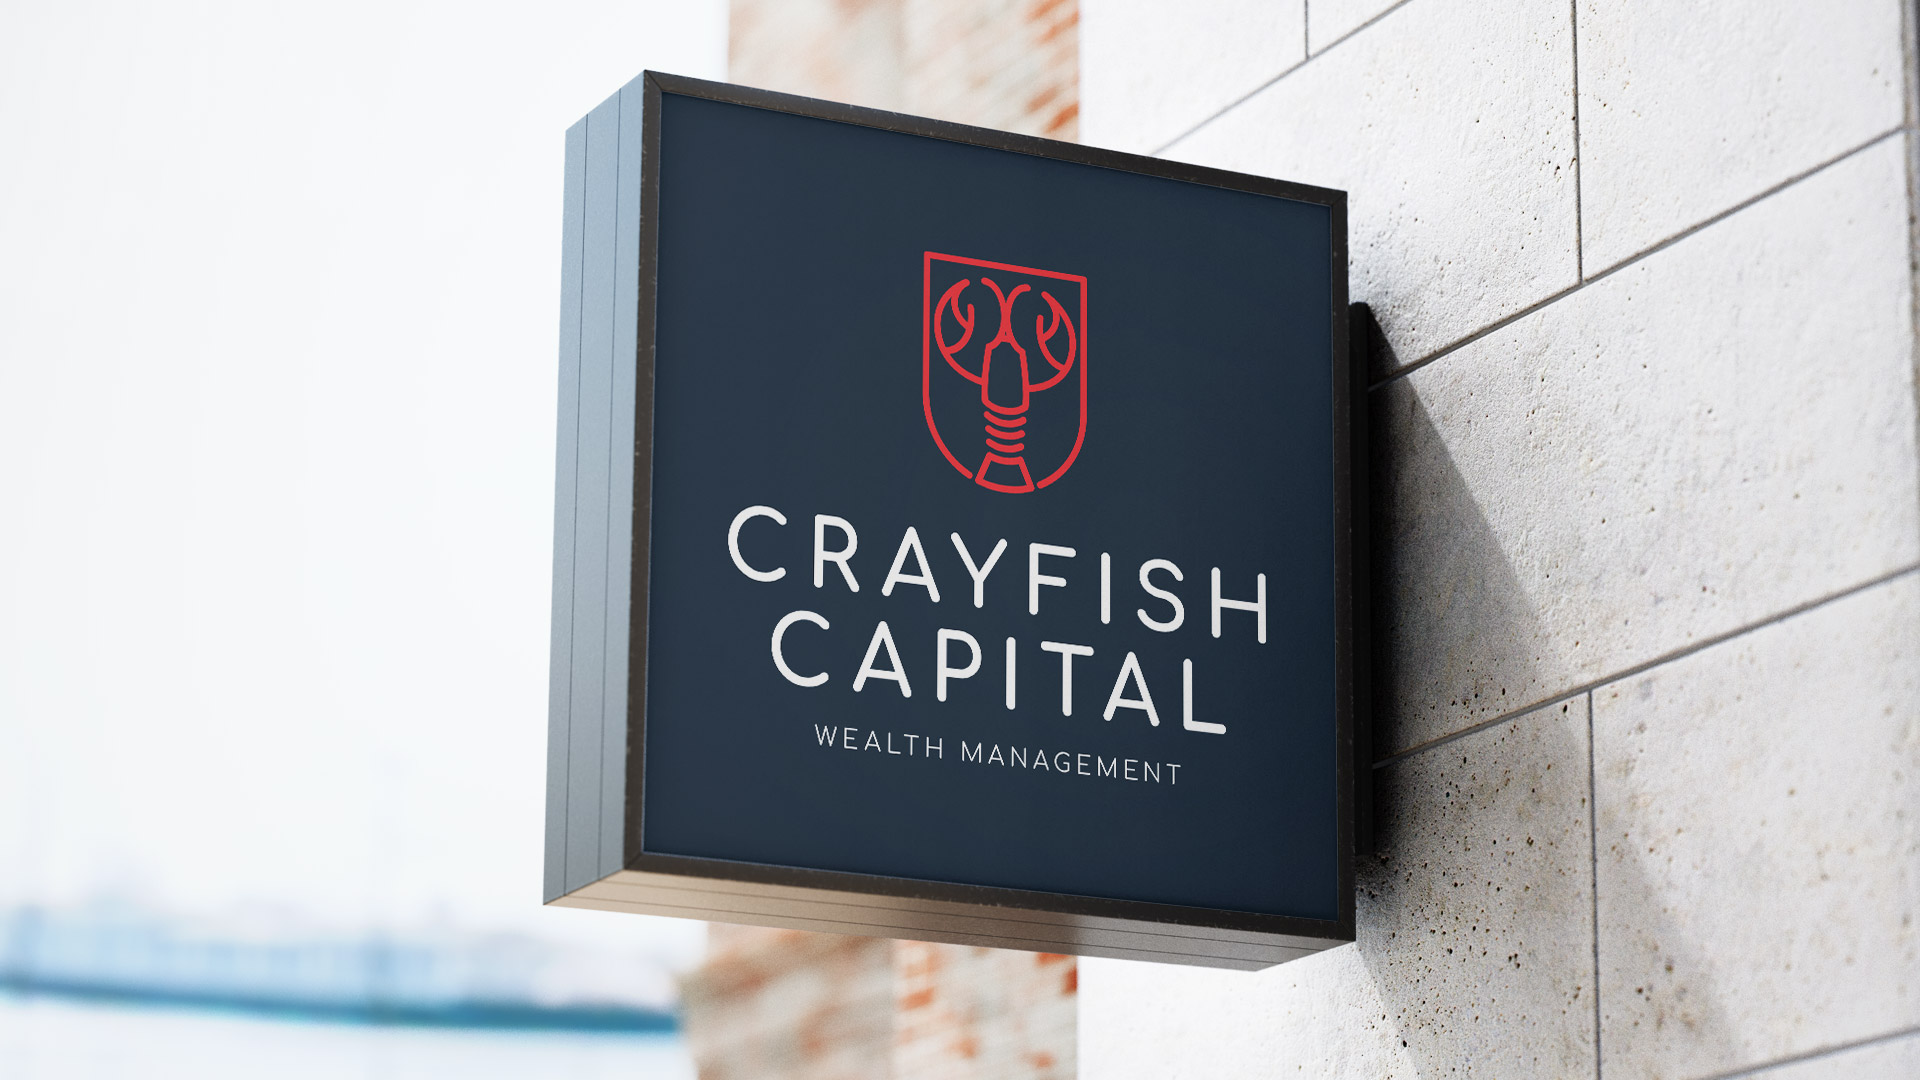 Crayfish Capital Image 2